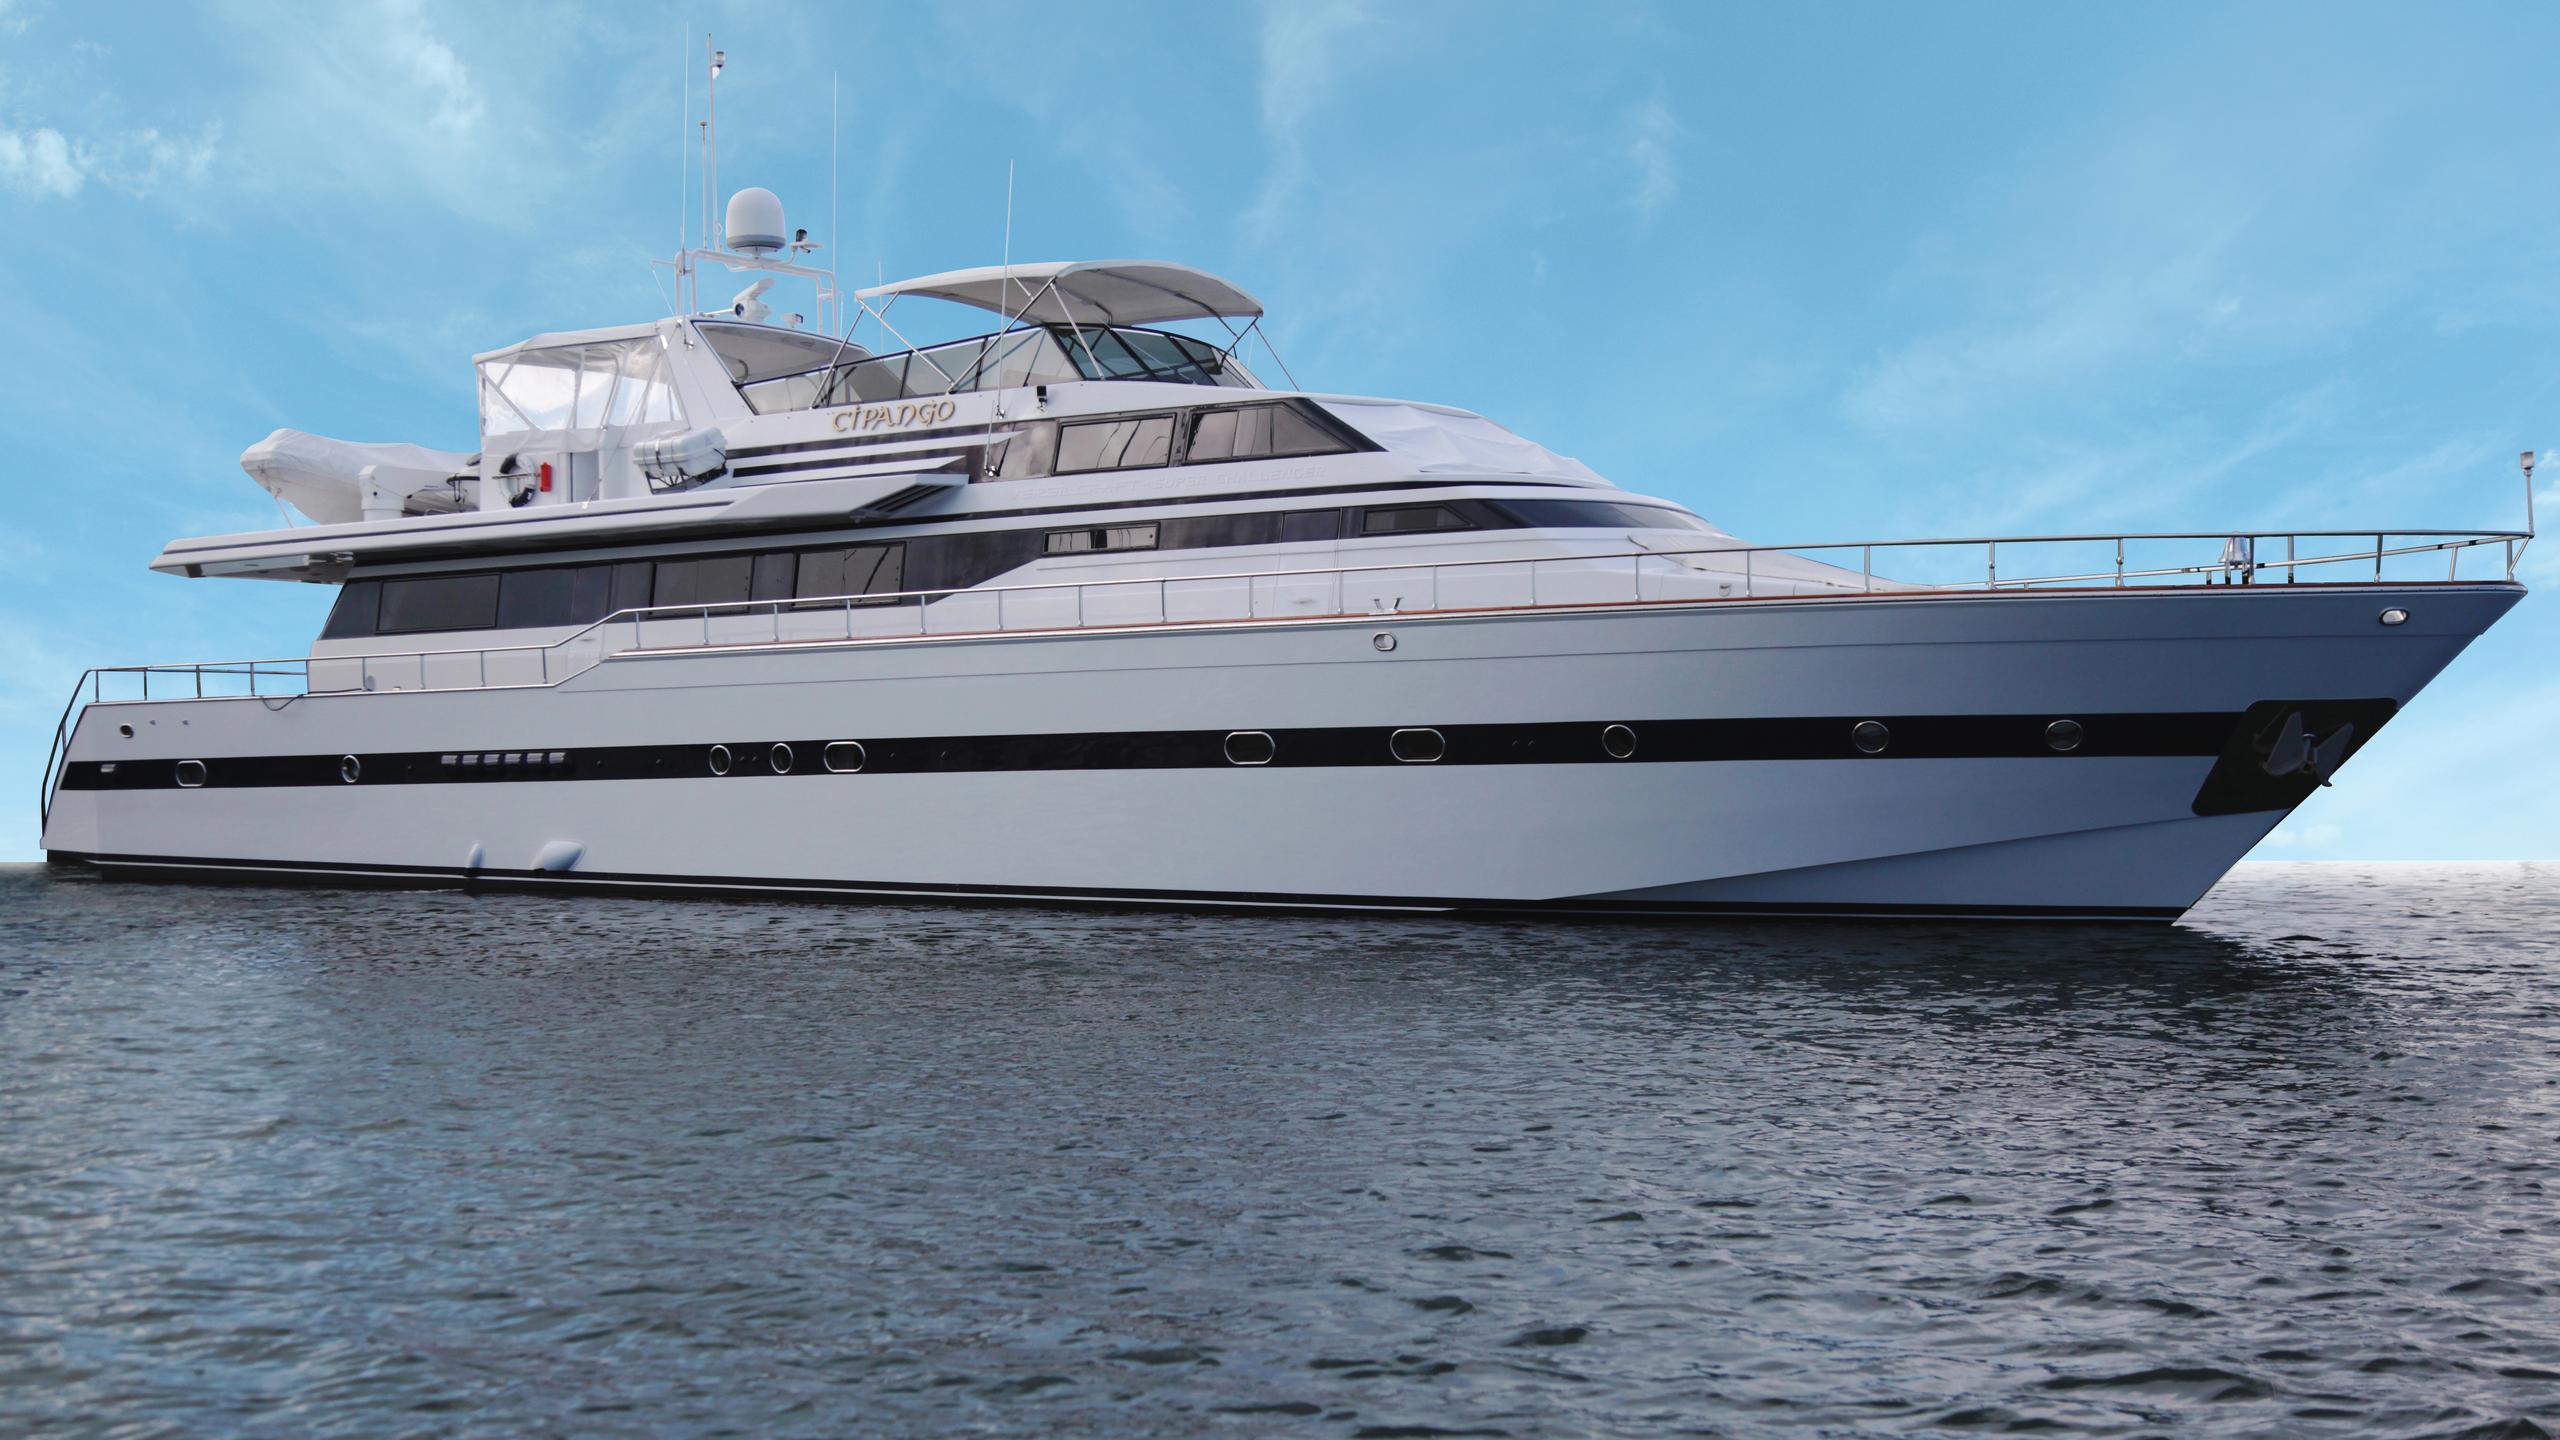 cipango-yacht-for-sale-profile